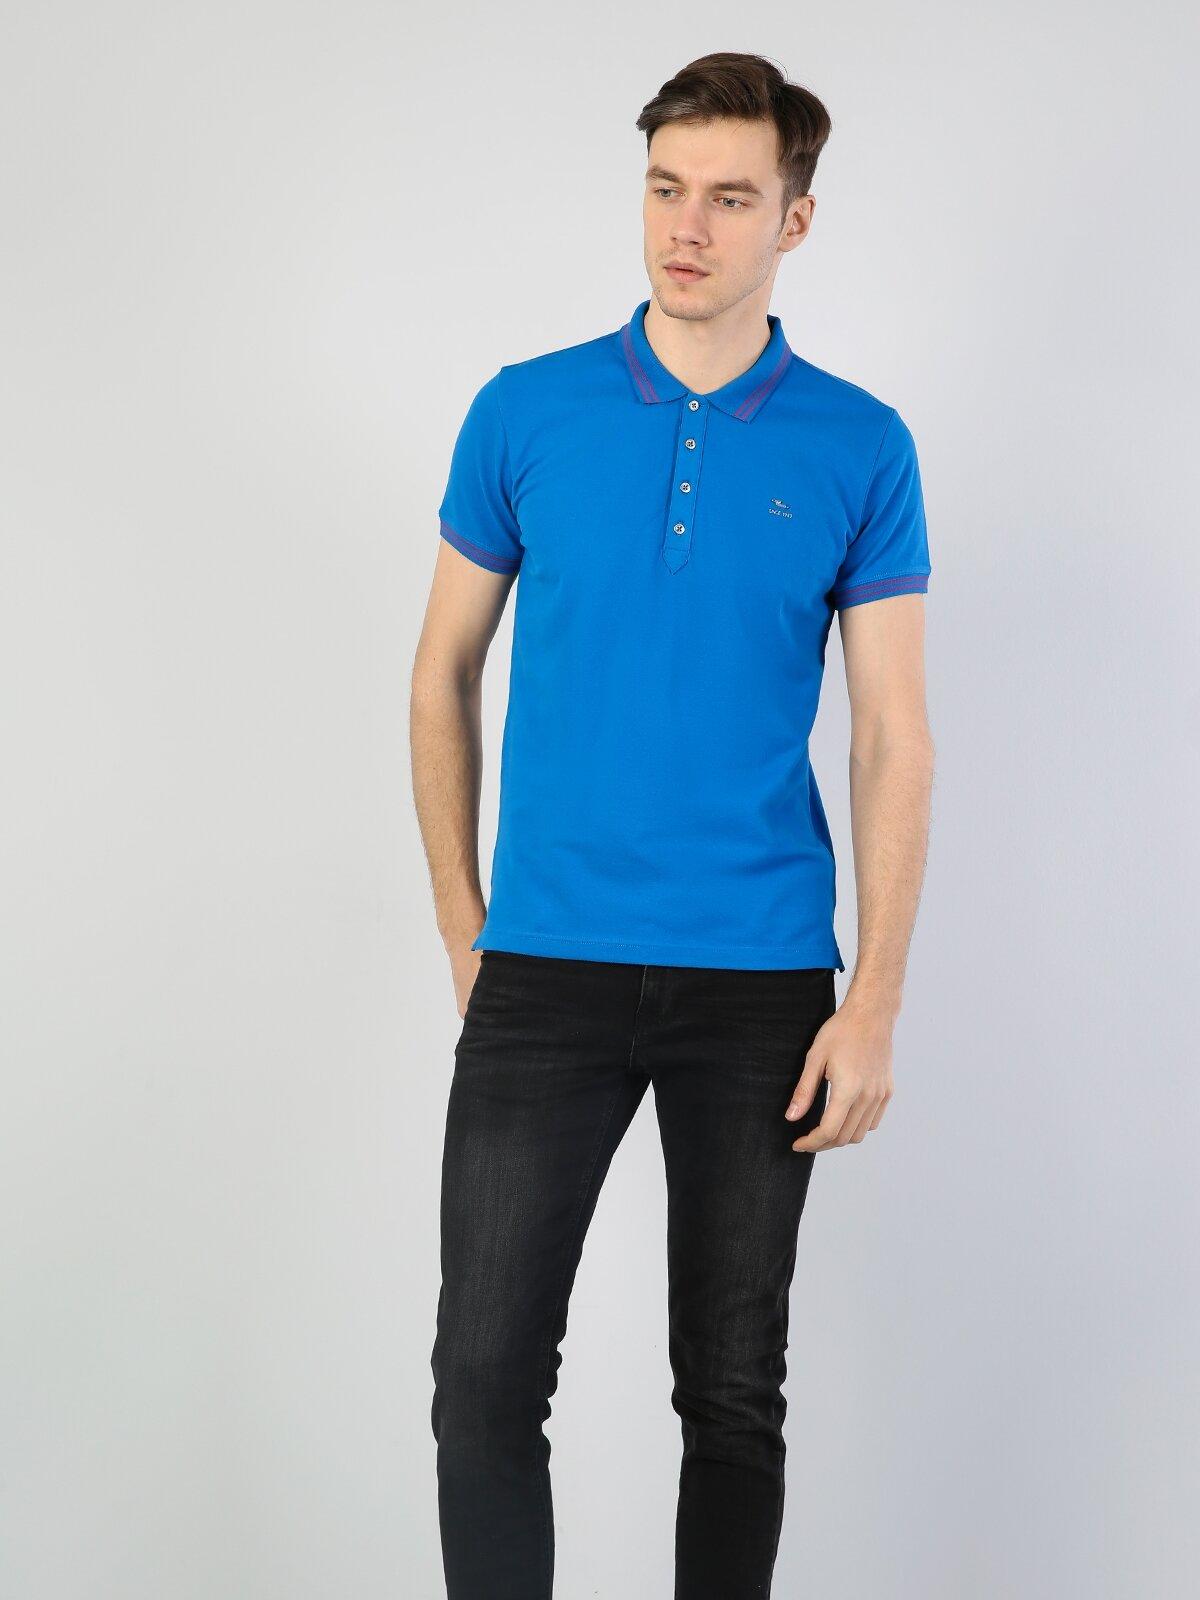 Slim Fit Polo Yaka Erkek Mavi Polo Kısa Kol